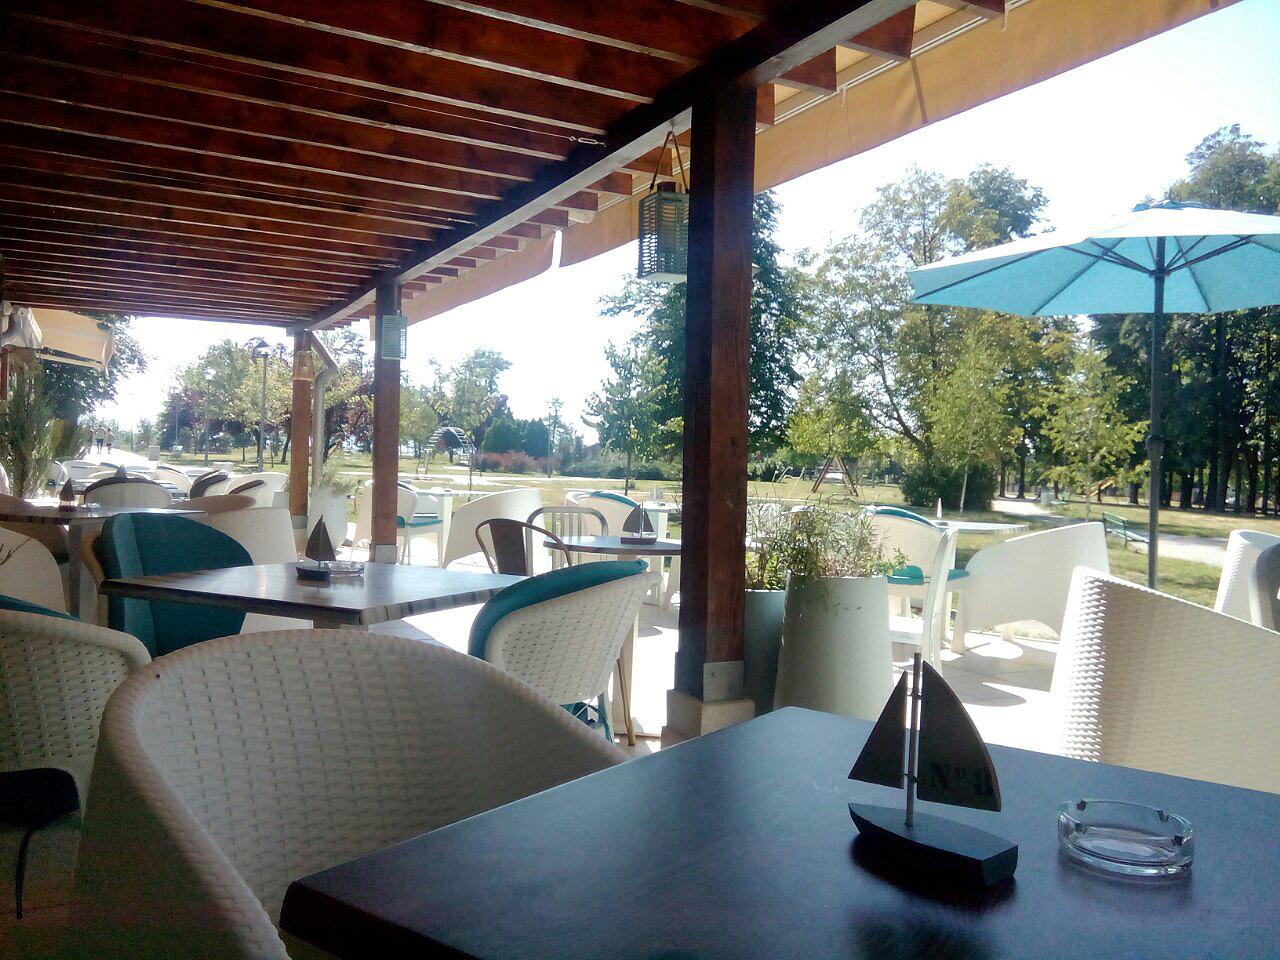 Restoran-Bagdala-Krusevac-070